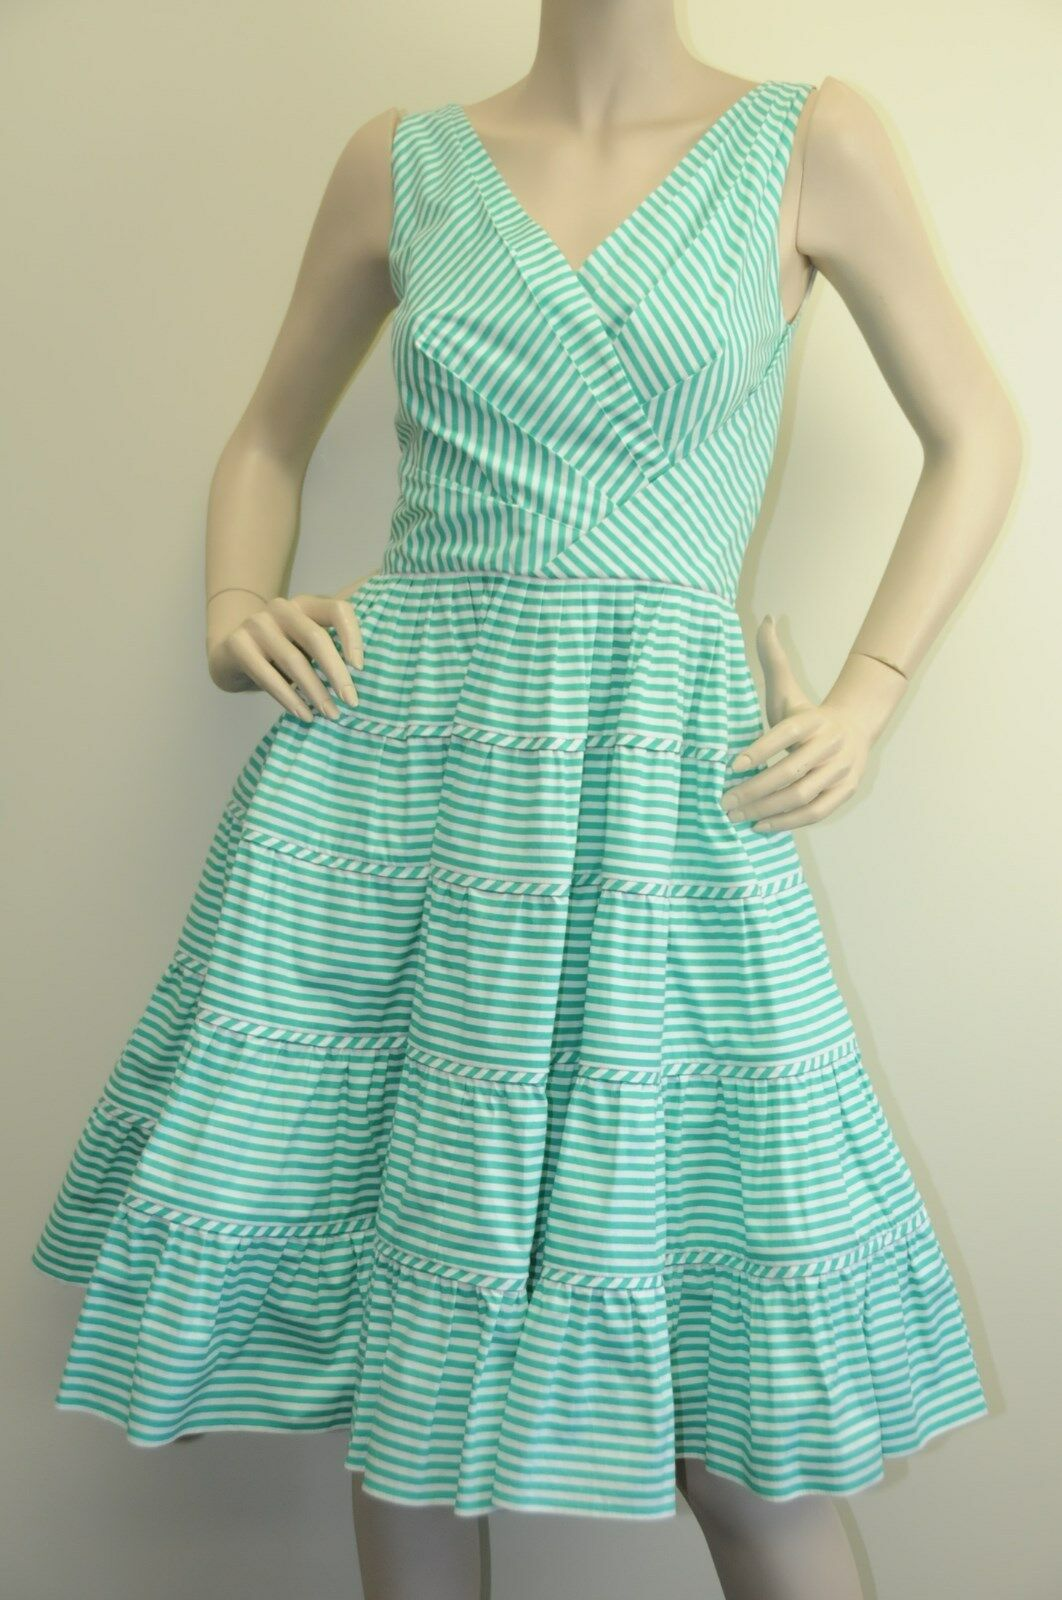 New Oscar de la Renta Capri Green White Striped S13 Summer DRESS 2